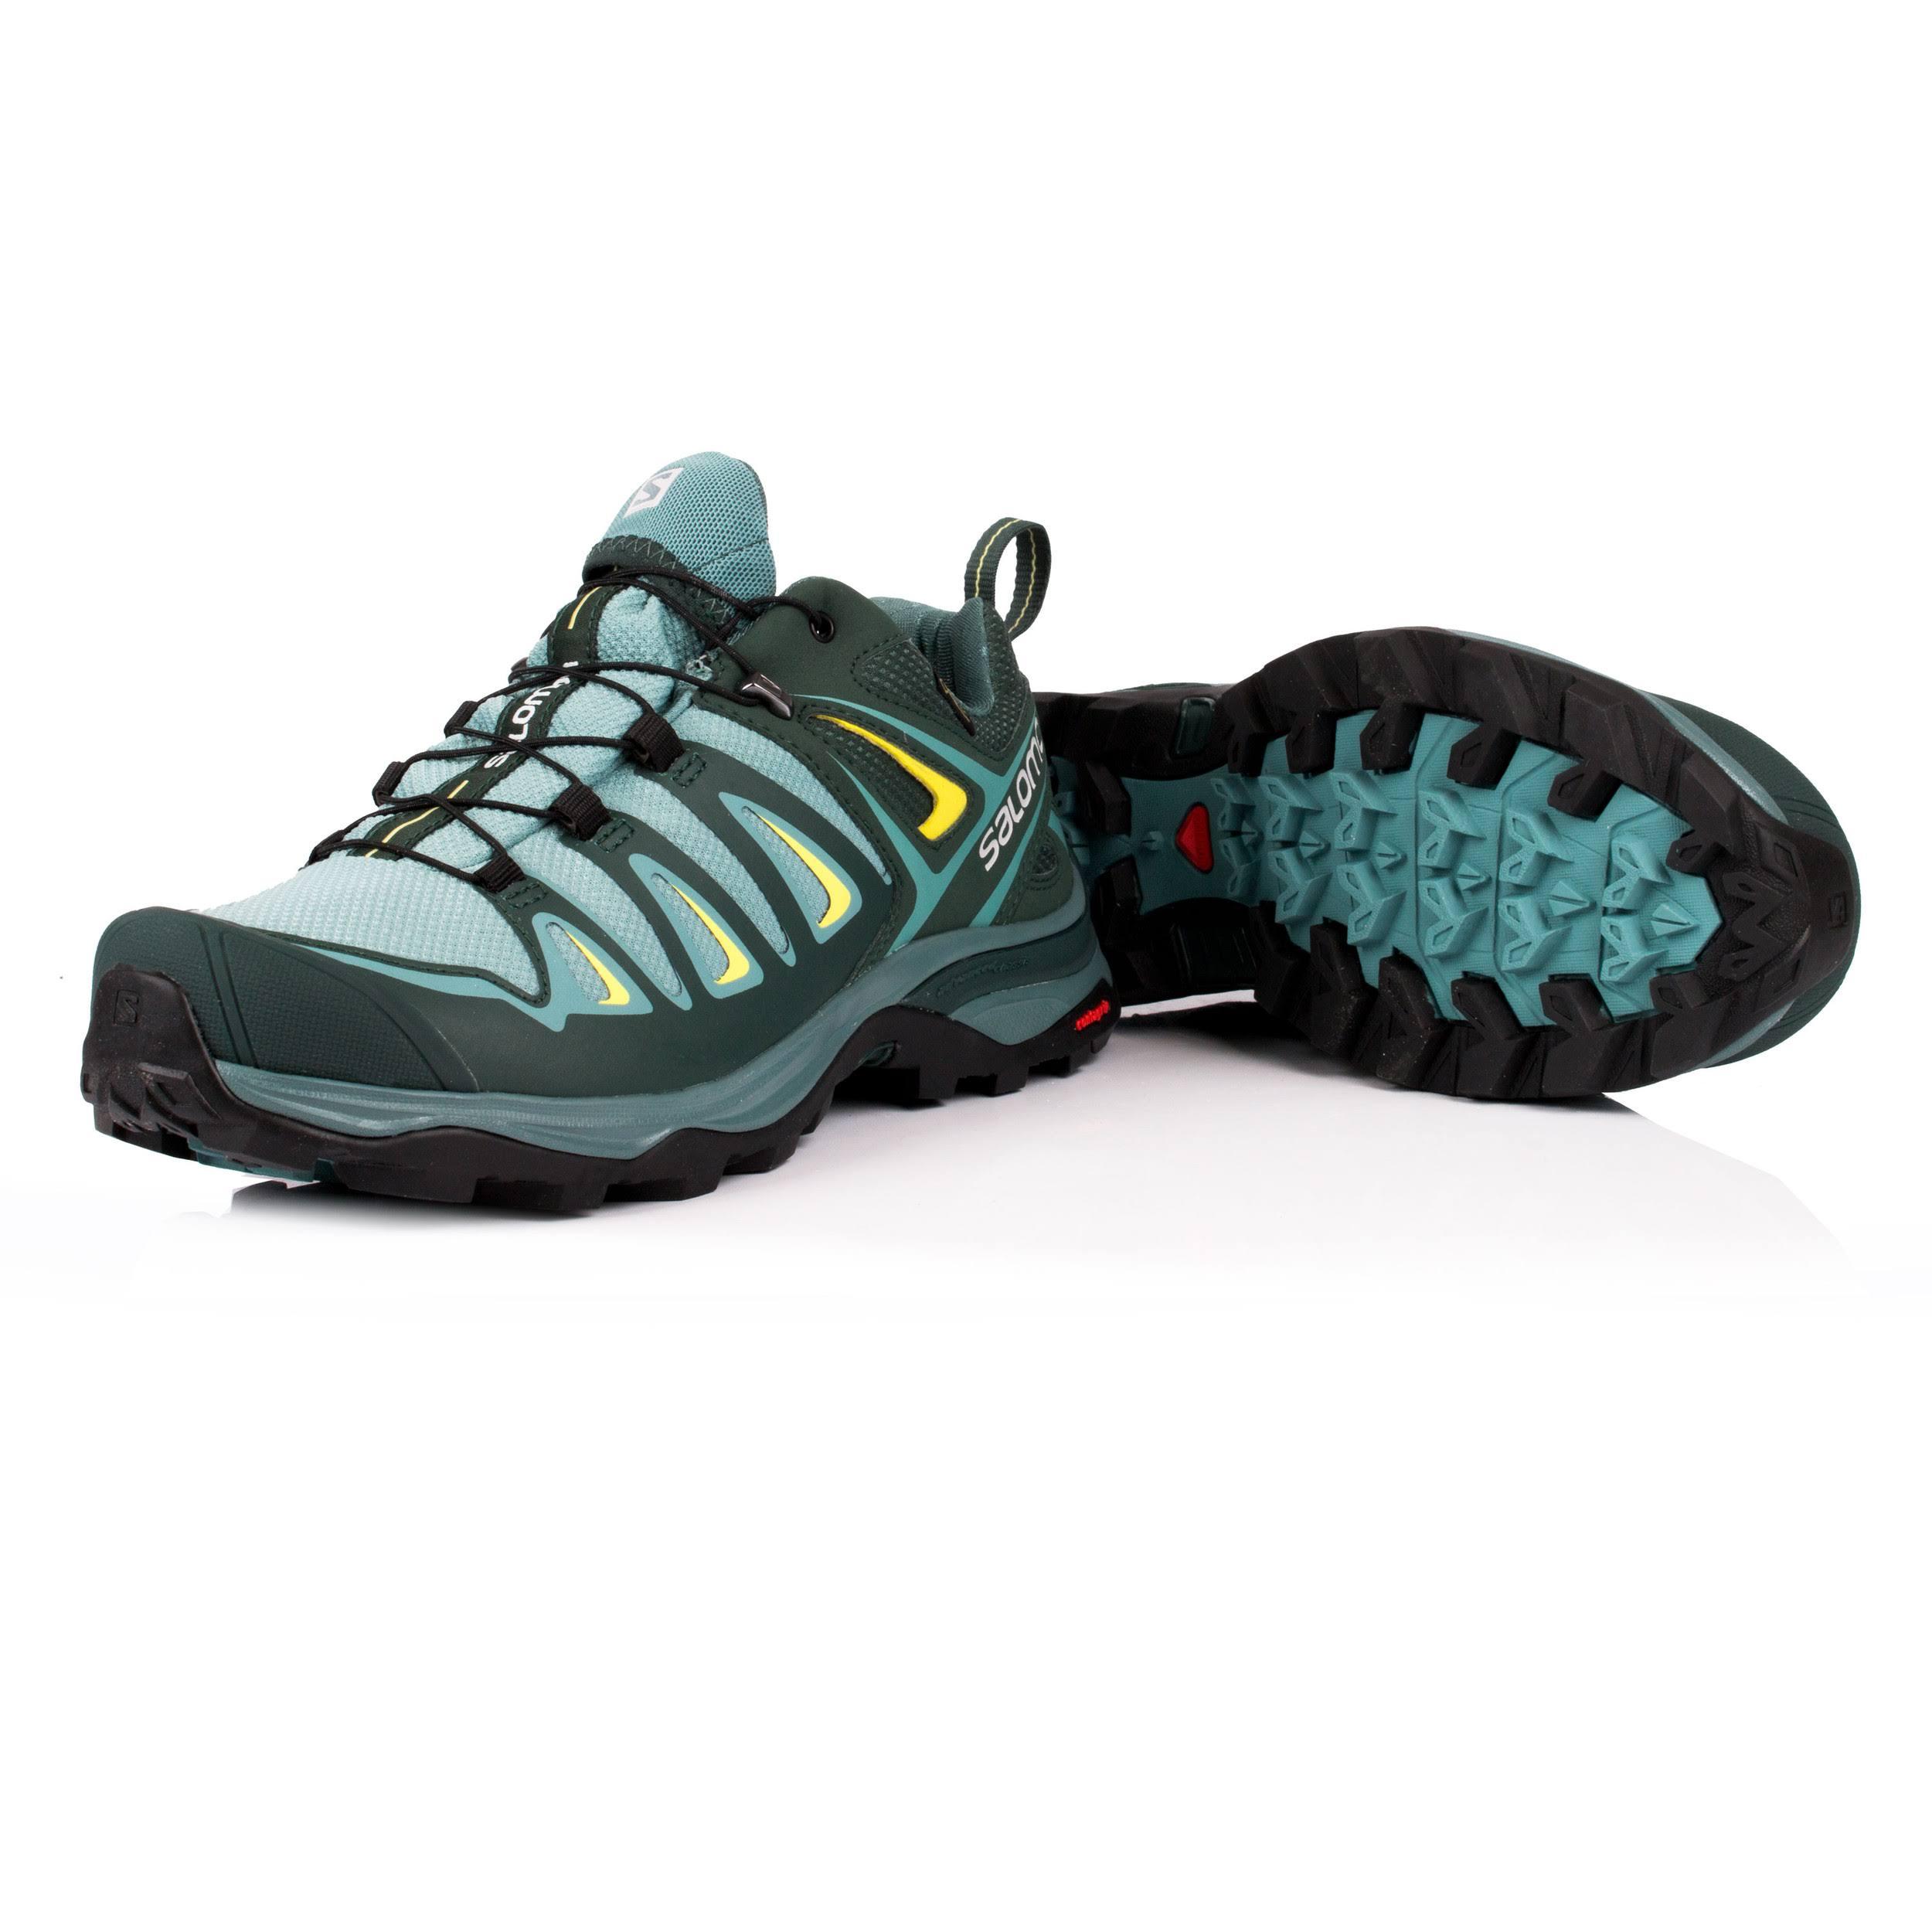 X sunny darkest Lime ultra Womens Shoe 3 Spruce Green Grey Salomon Gtx Arctic fq5zwxS